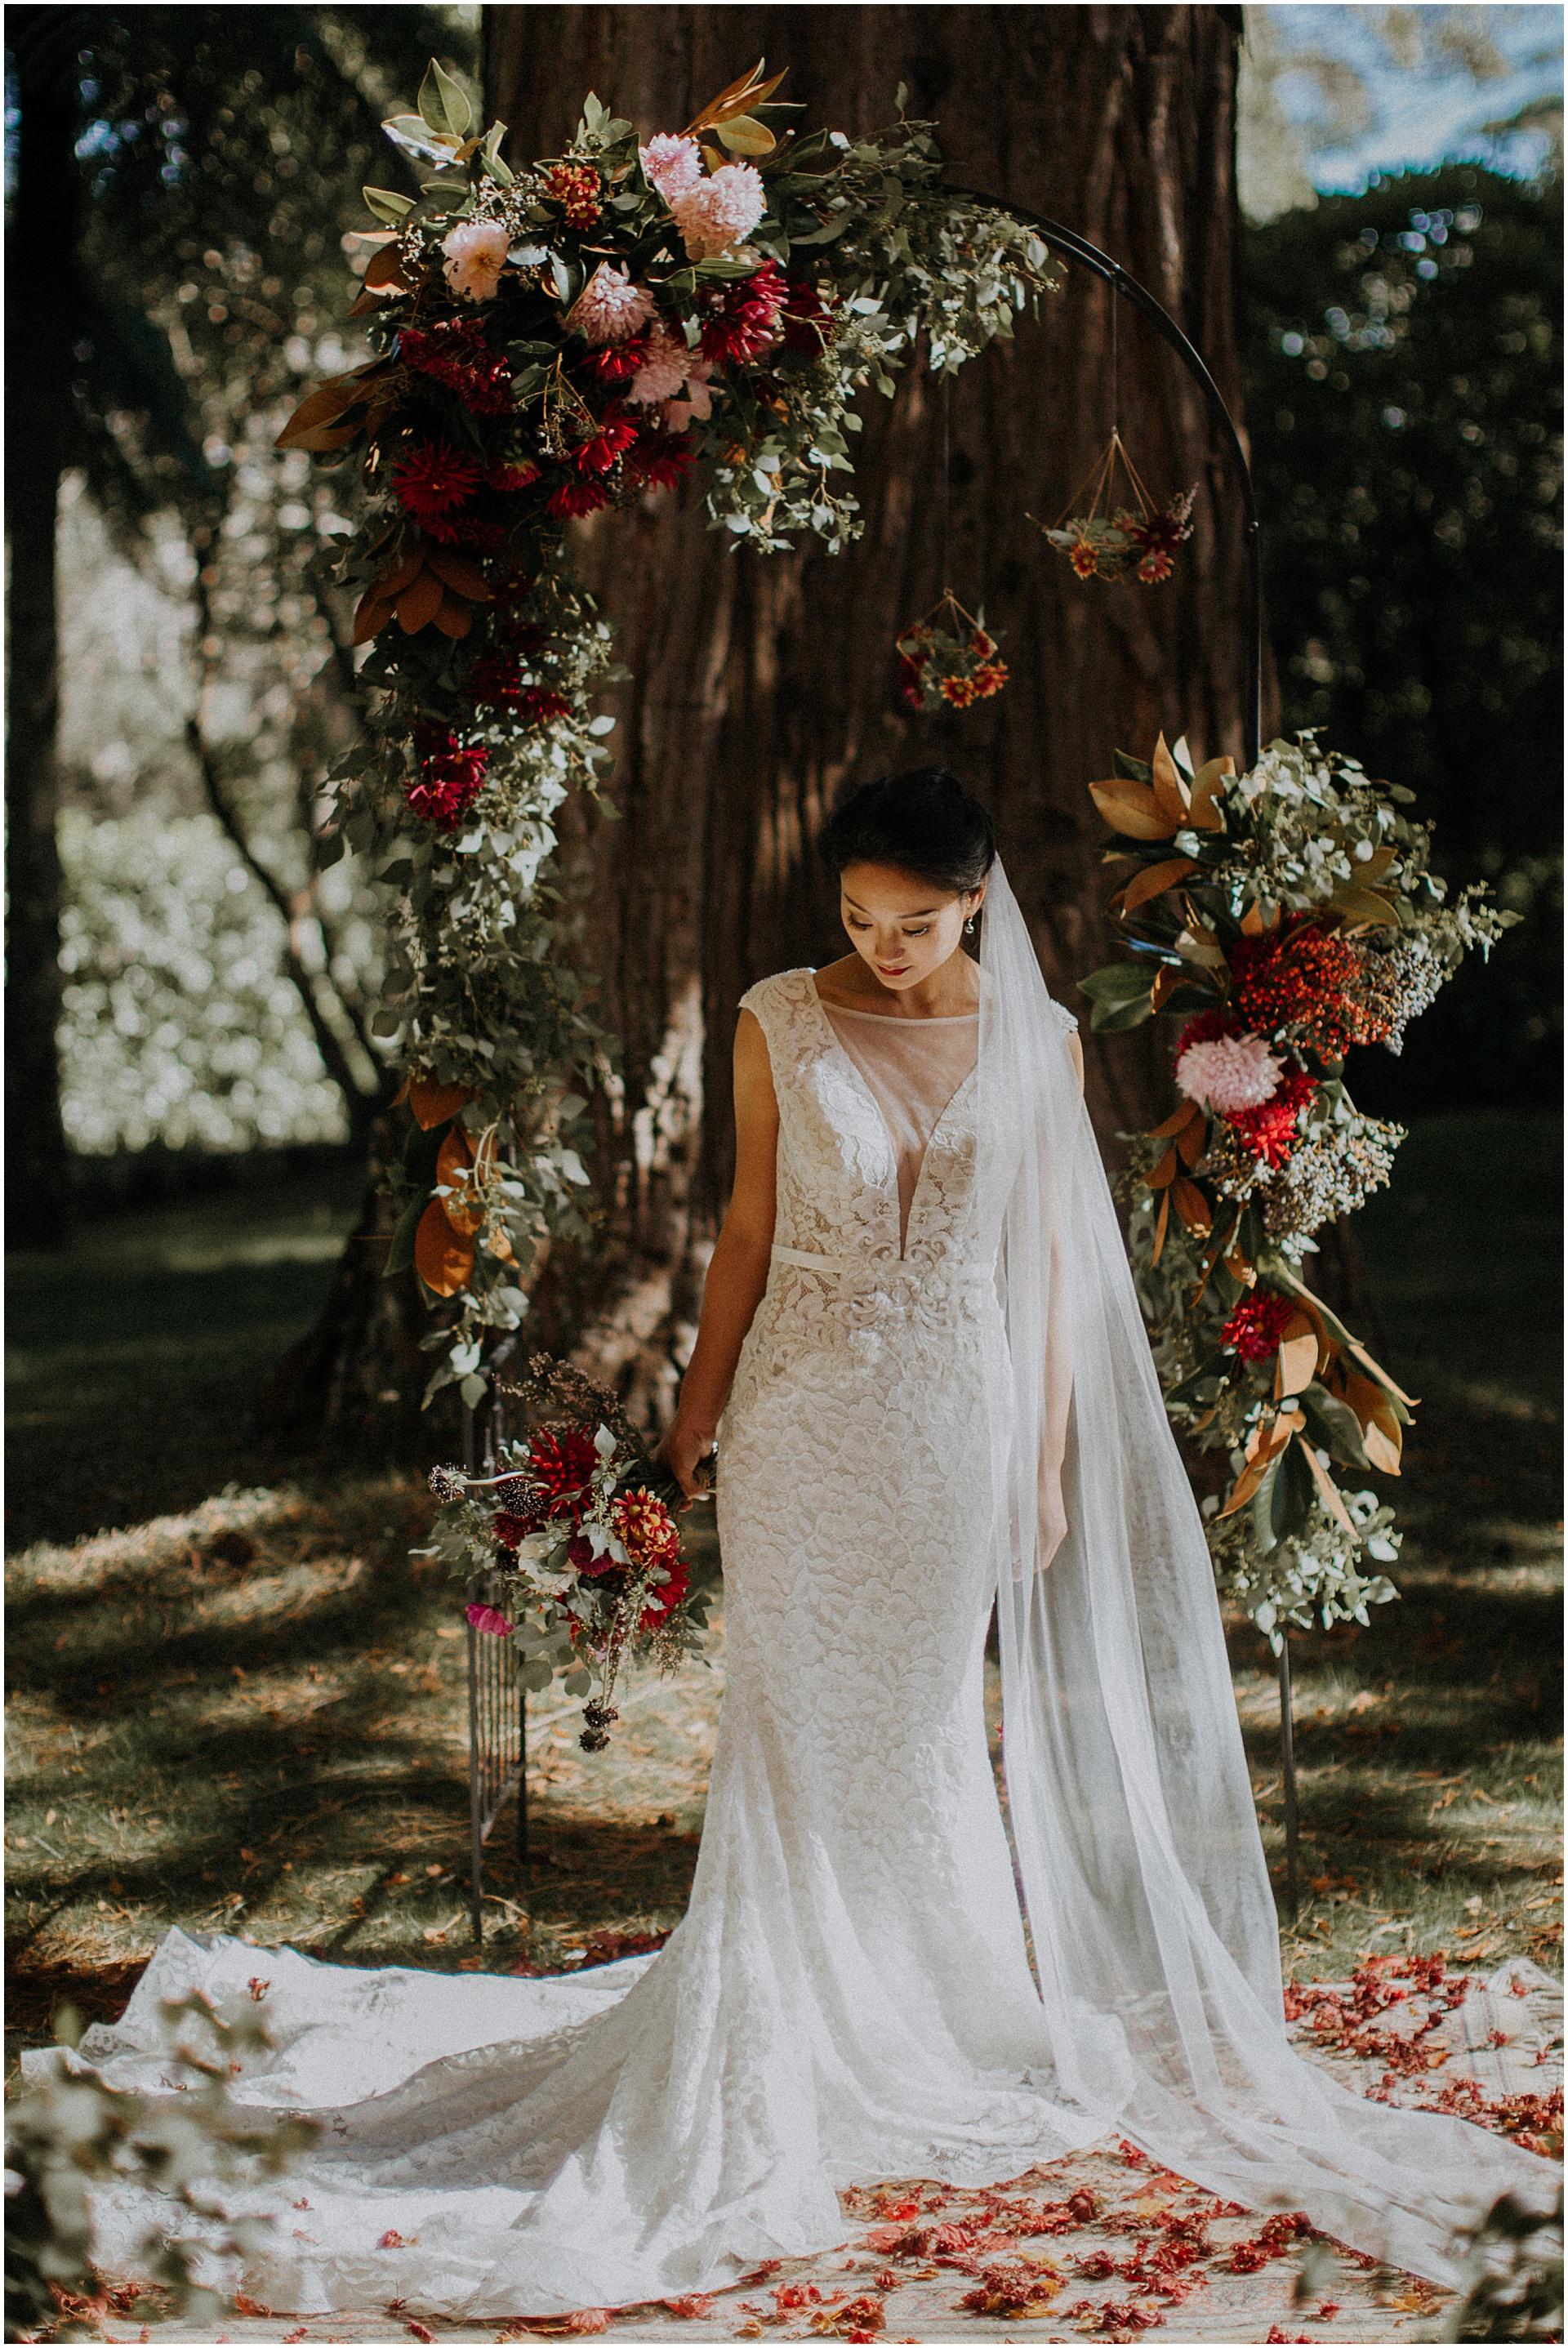 Joanne & Lee - Mini Wedding